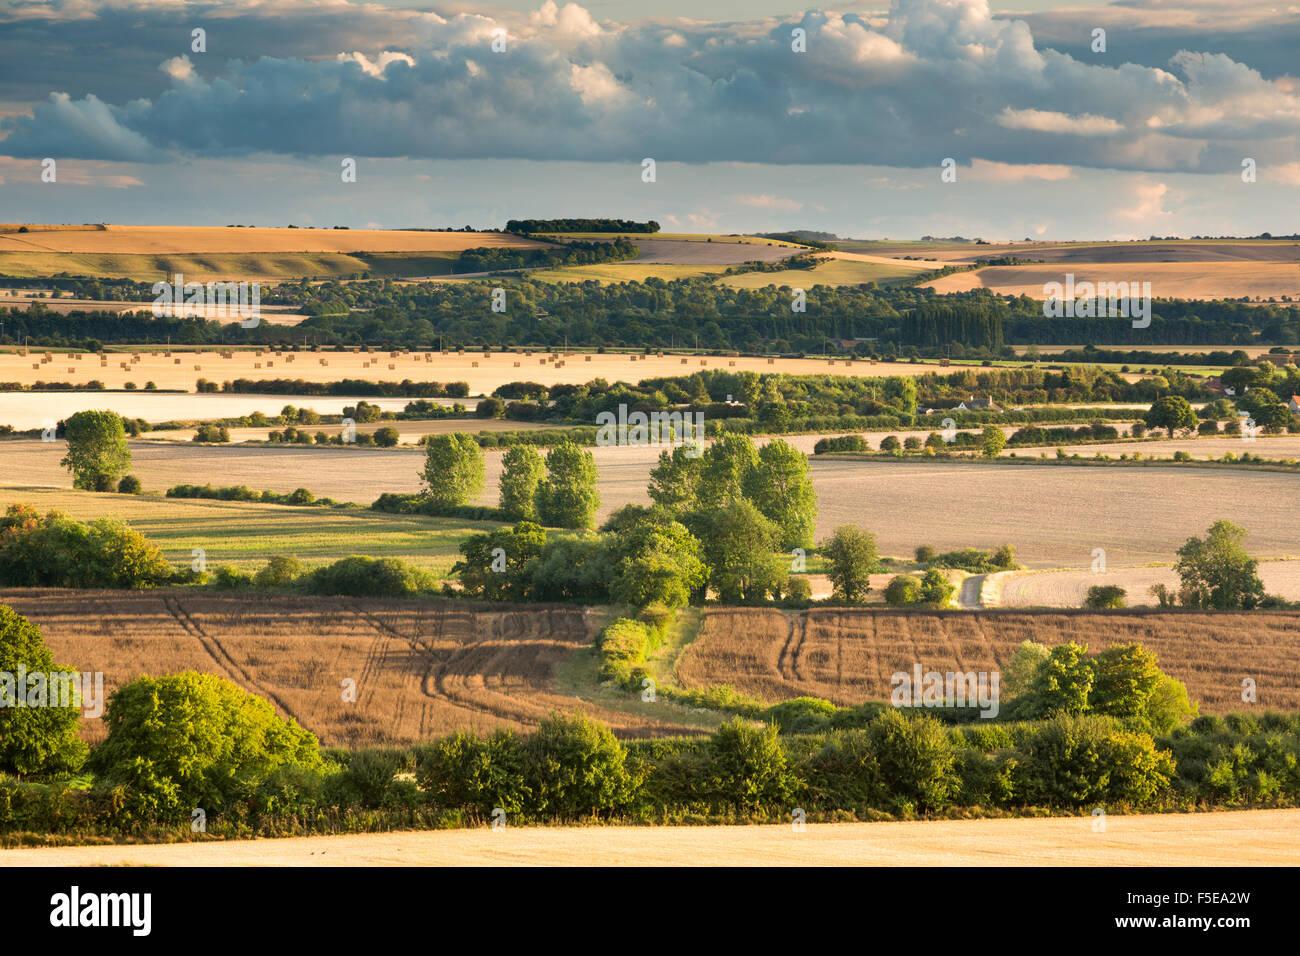 Wittenham Clumps, Thames Valley, Oxfordshire, England, United Kingdom, Europe - Stock Image